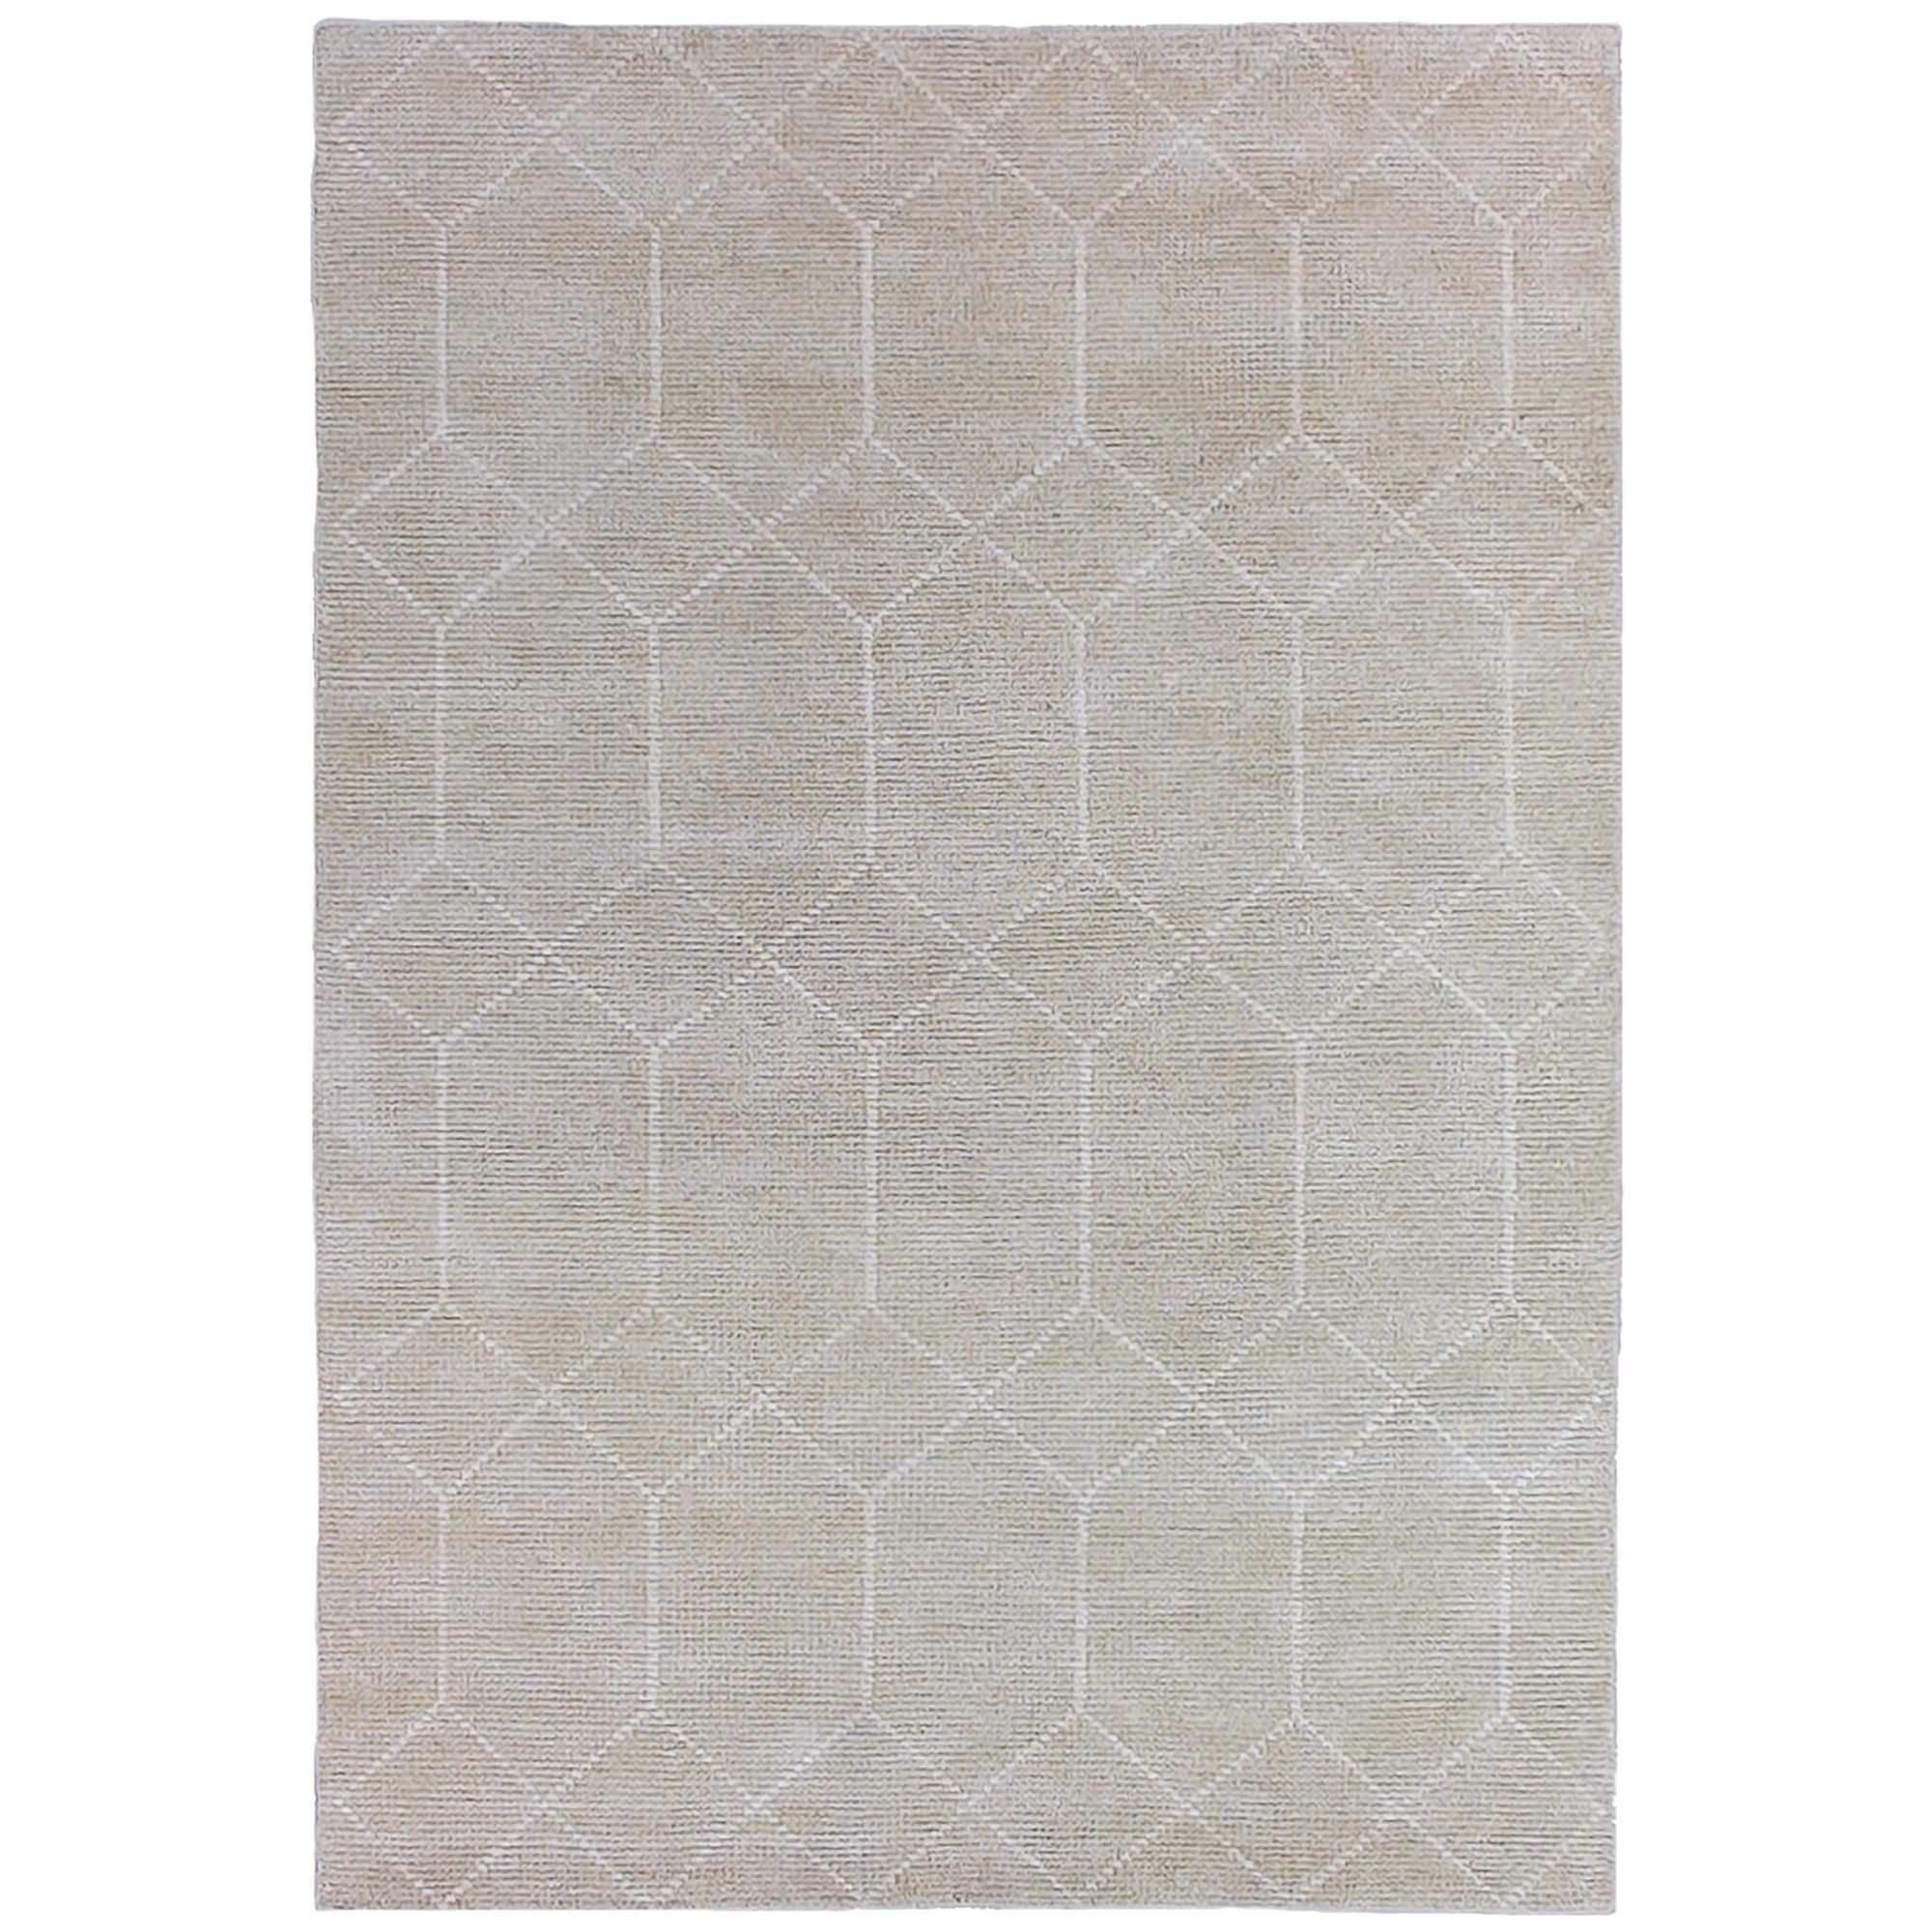 Geometrics Hand Knotted Wool Rug, 300x400cm, Silvery Beige